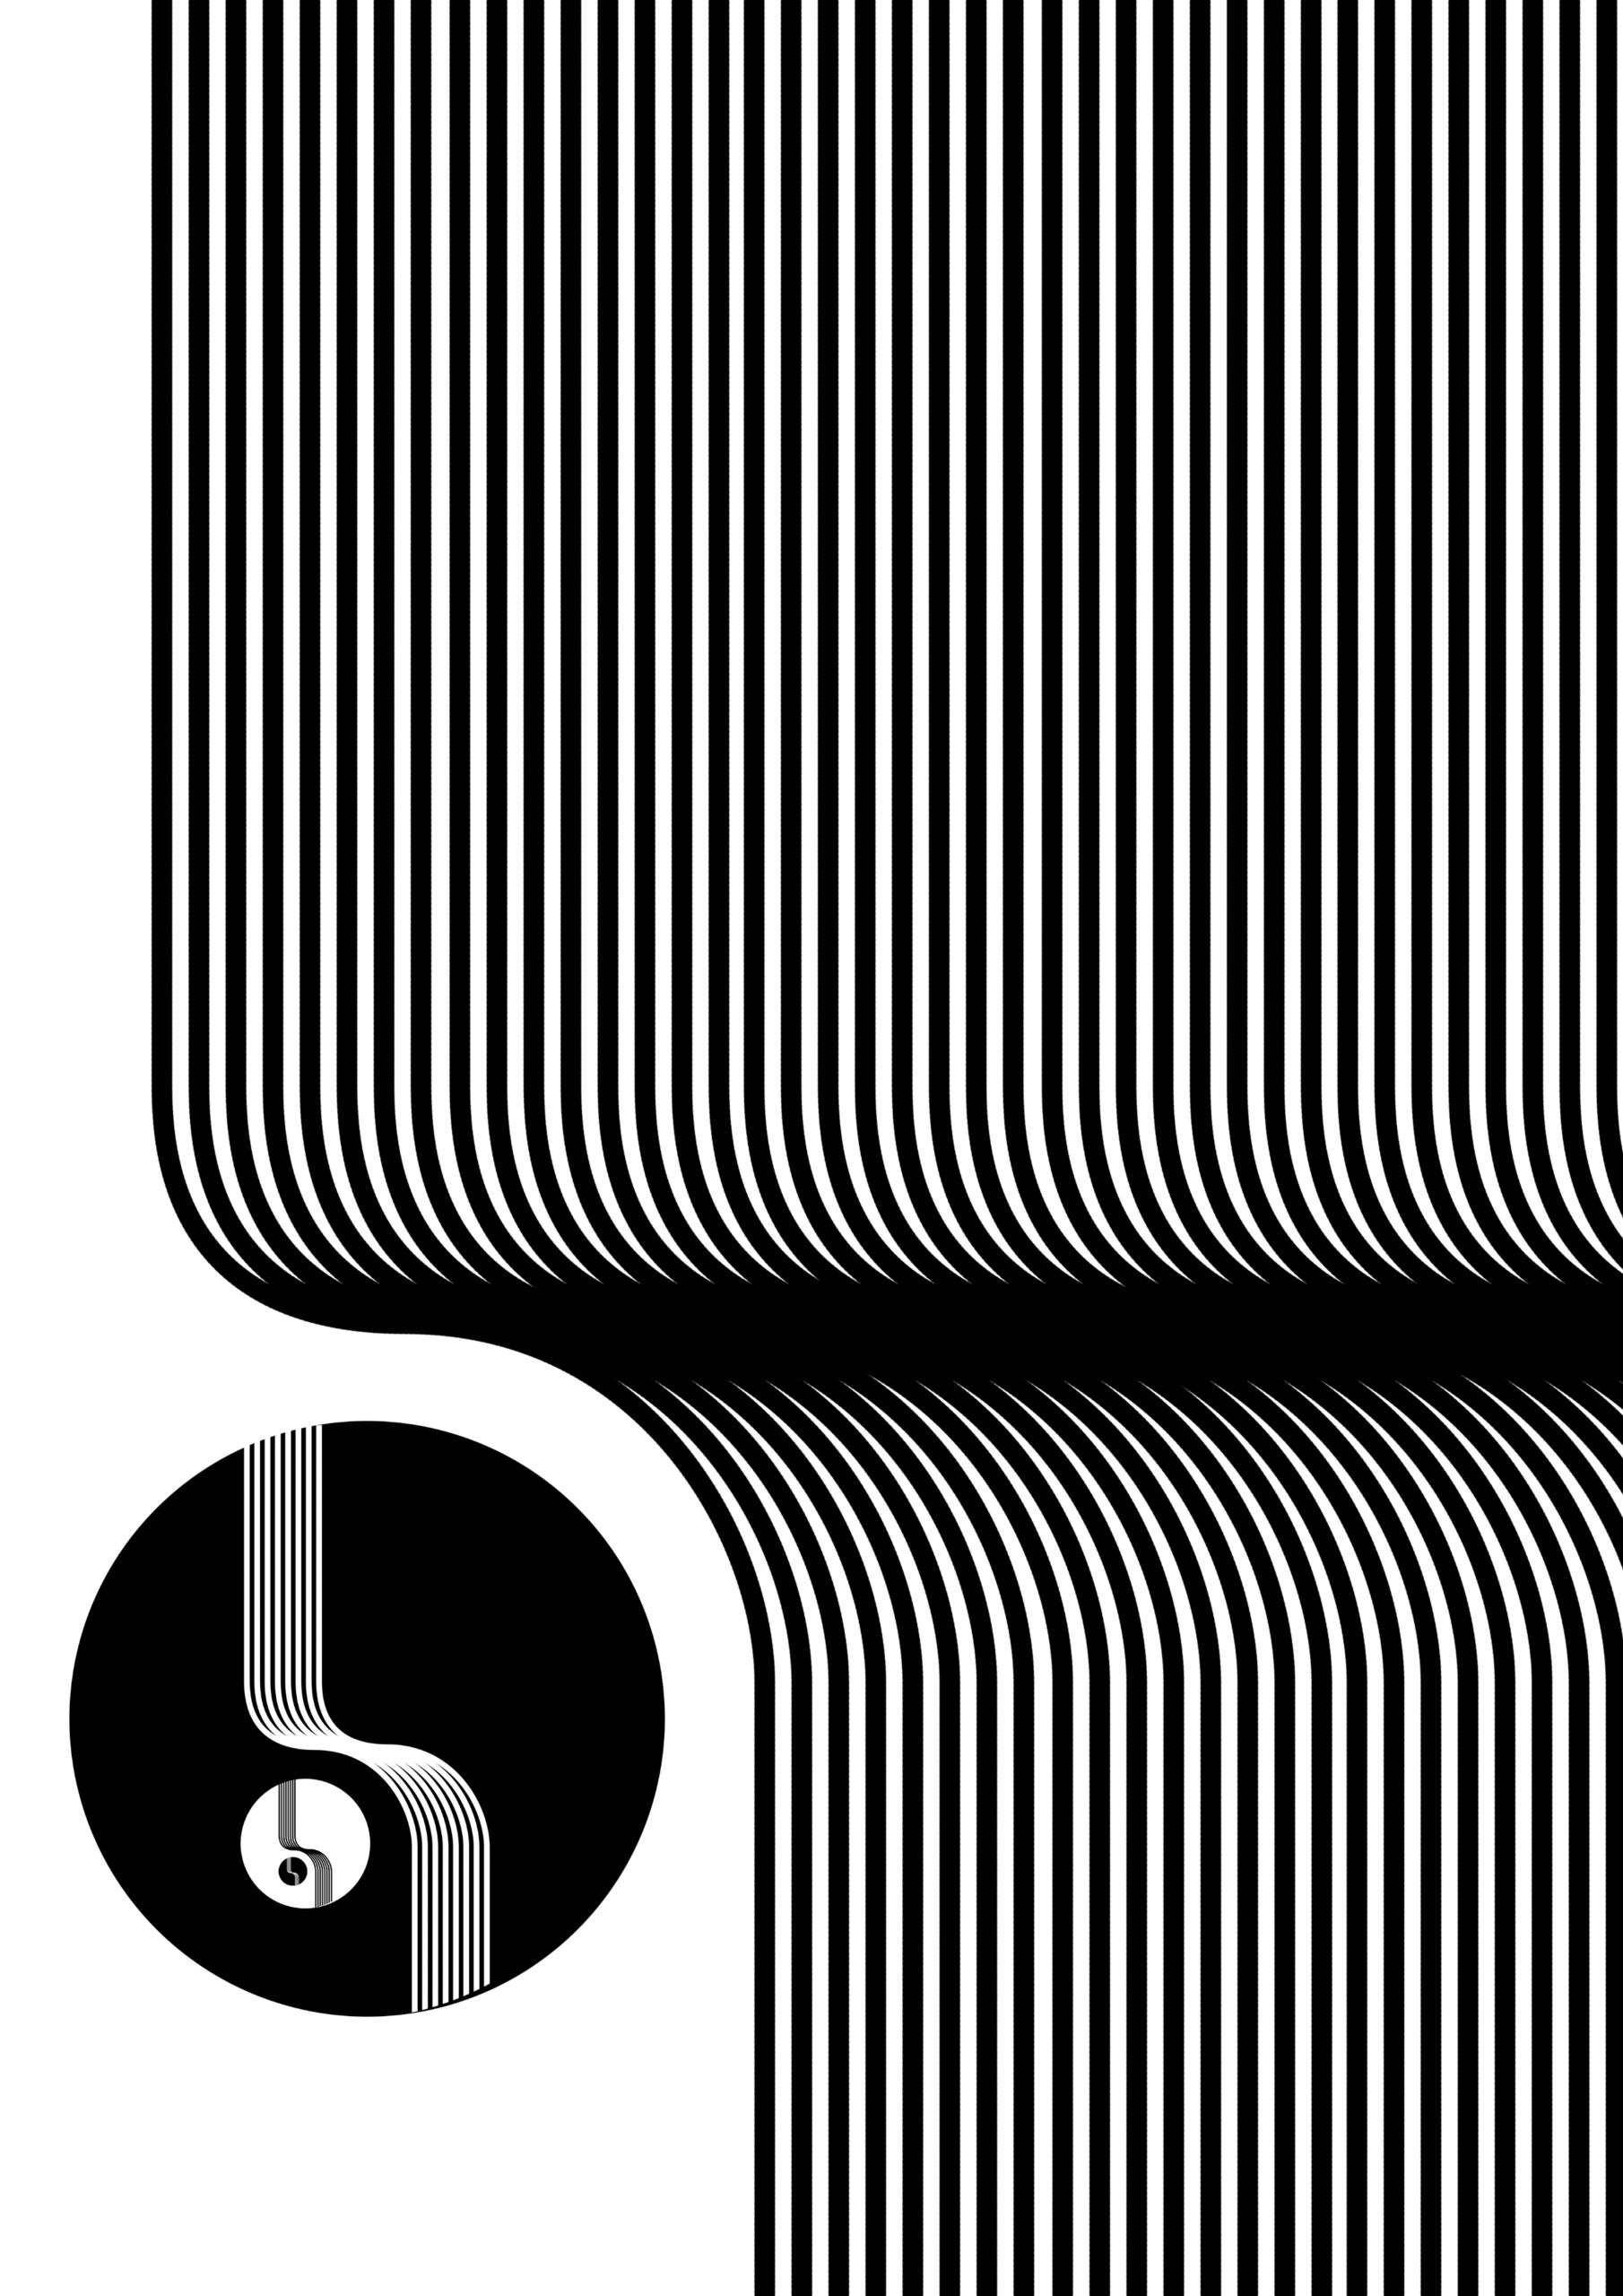 Sequential - dimension?, poster - spandanb | ello